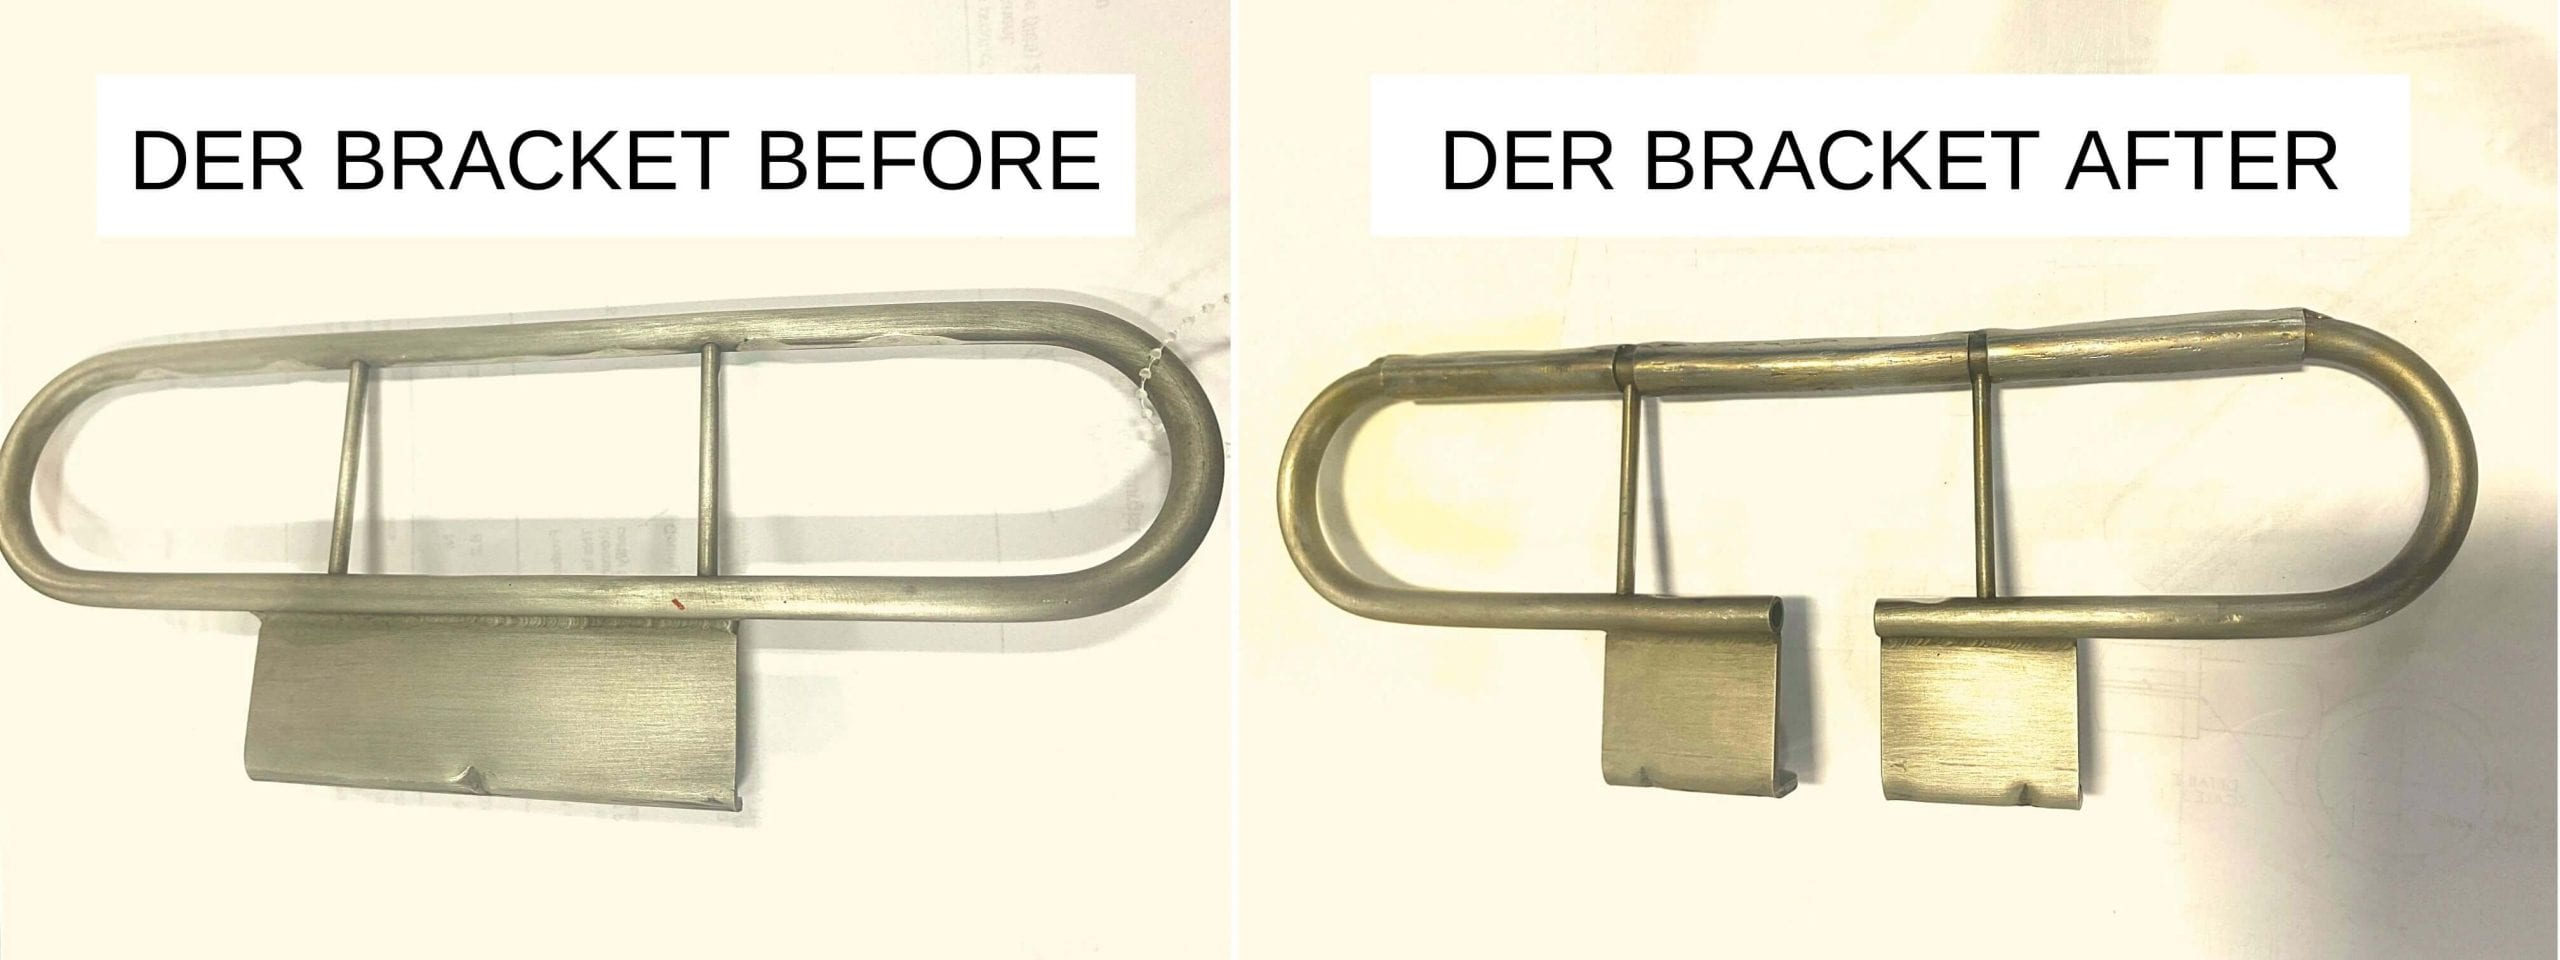 der-bracket-before-and-after